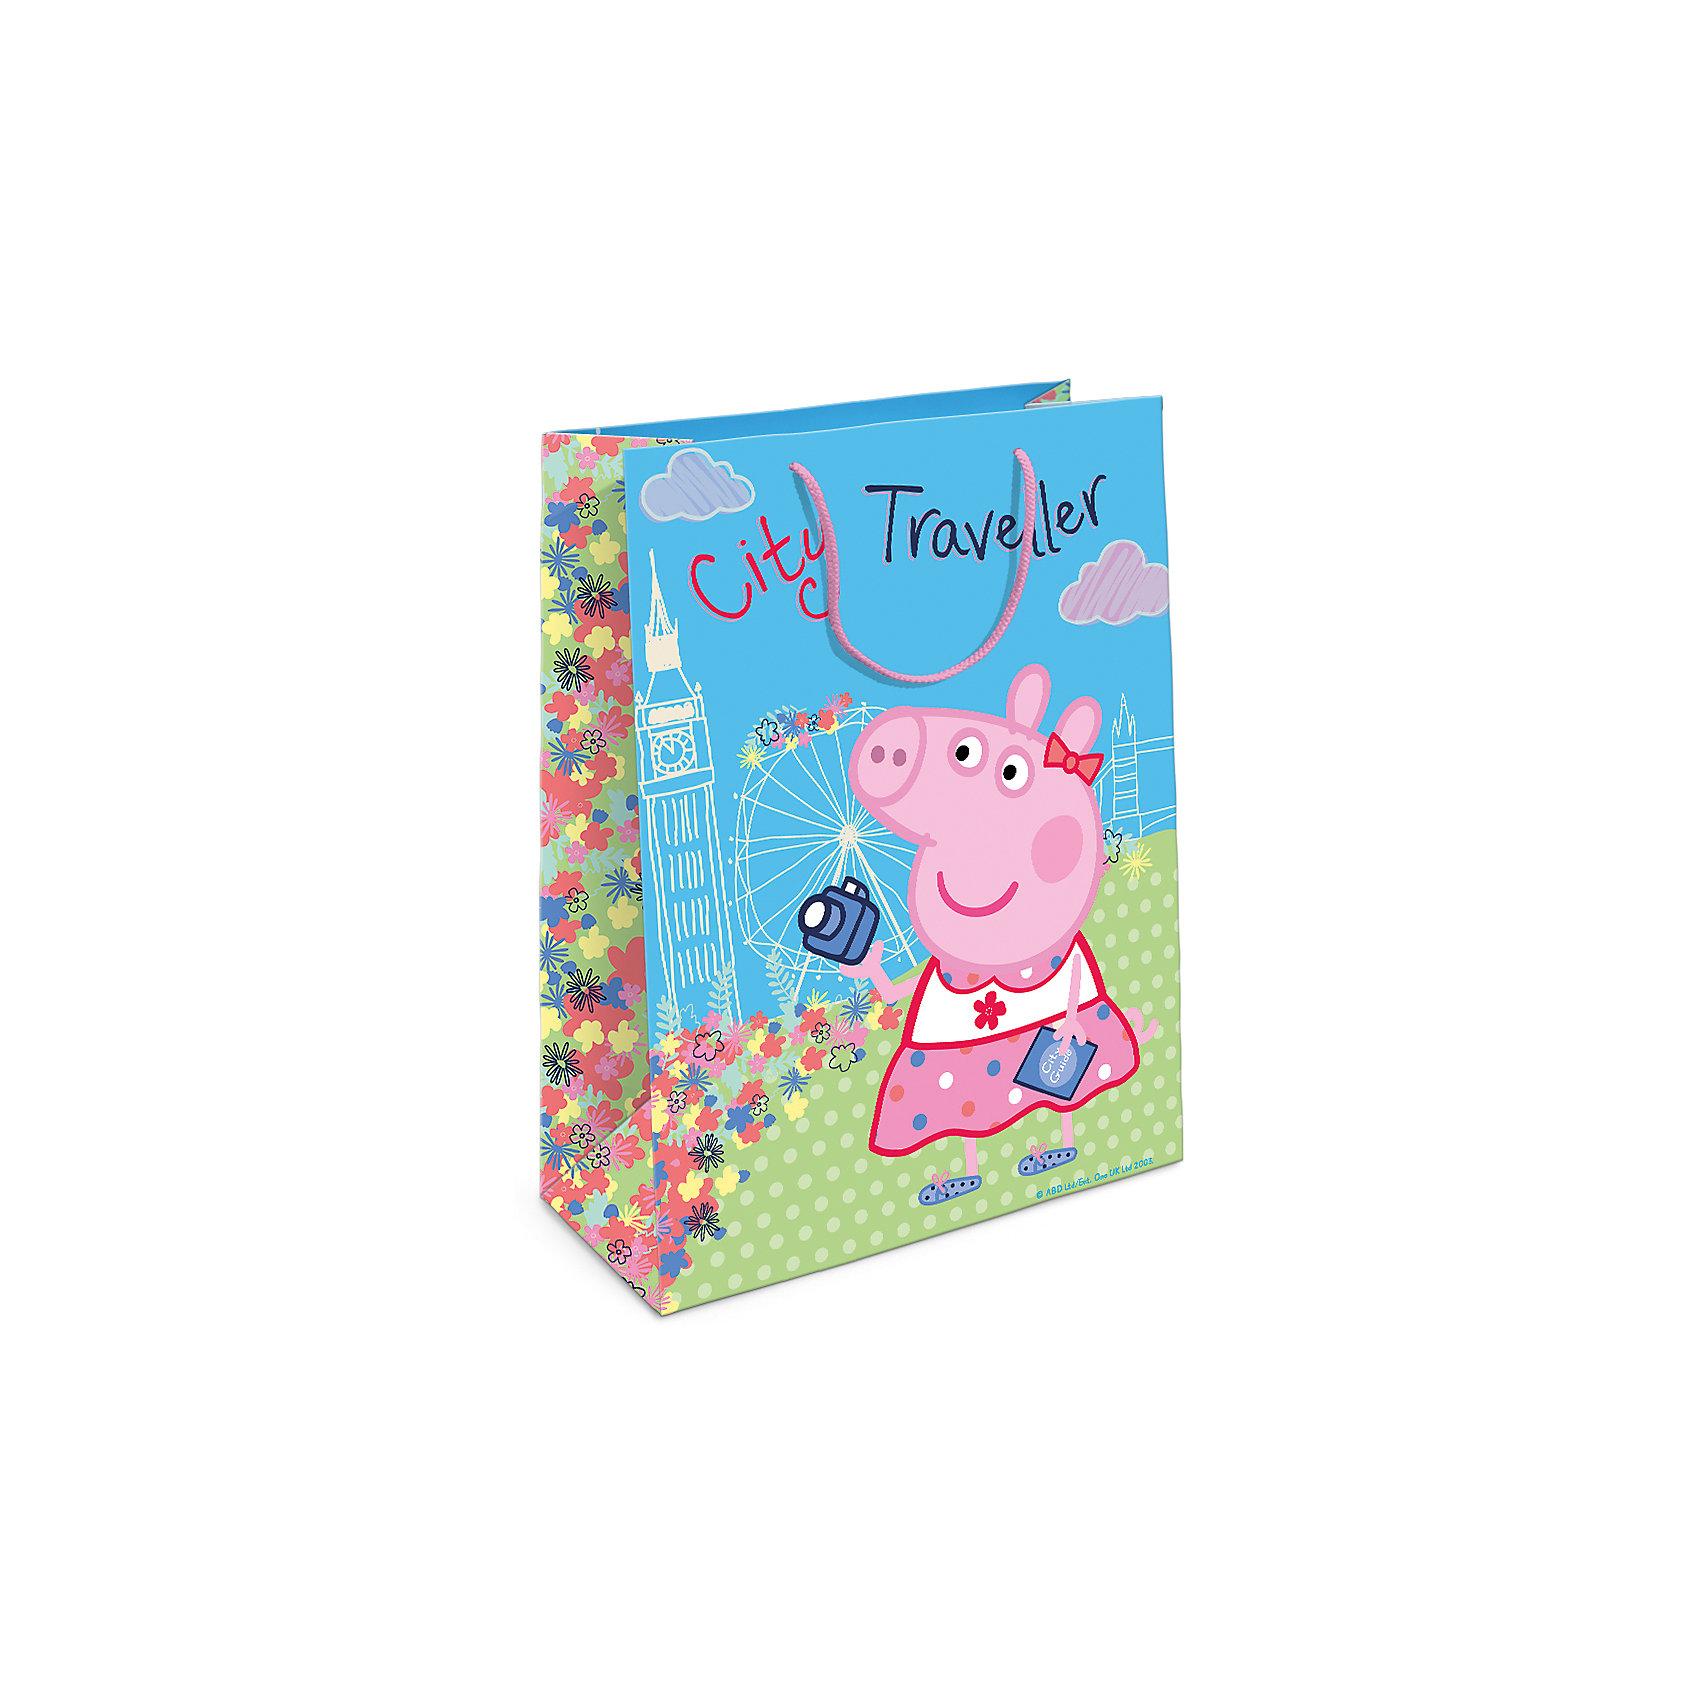 Росмэн Пакет подарочный  Пеппа на каникулах, 35*25*9 peppa pig пакет подарочный пеппа и сьюзи 35 х 25 х 9 см